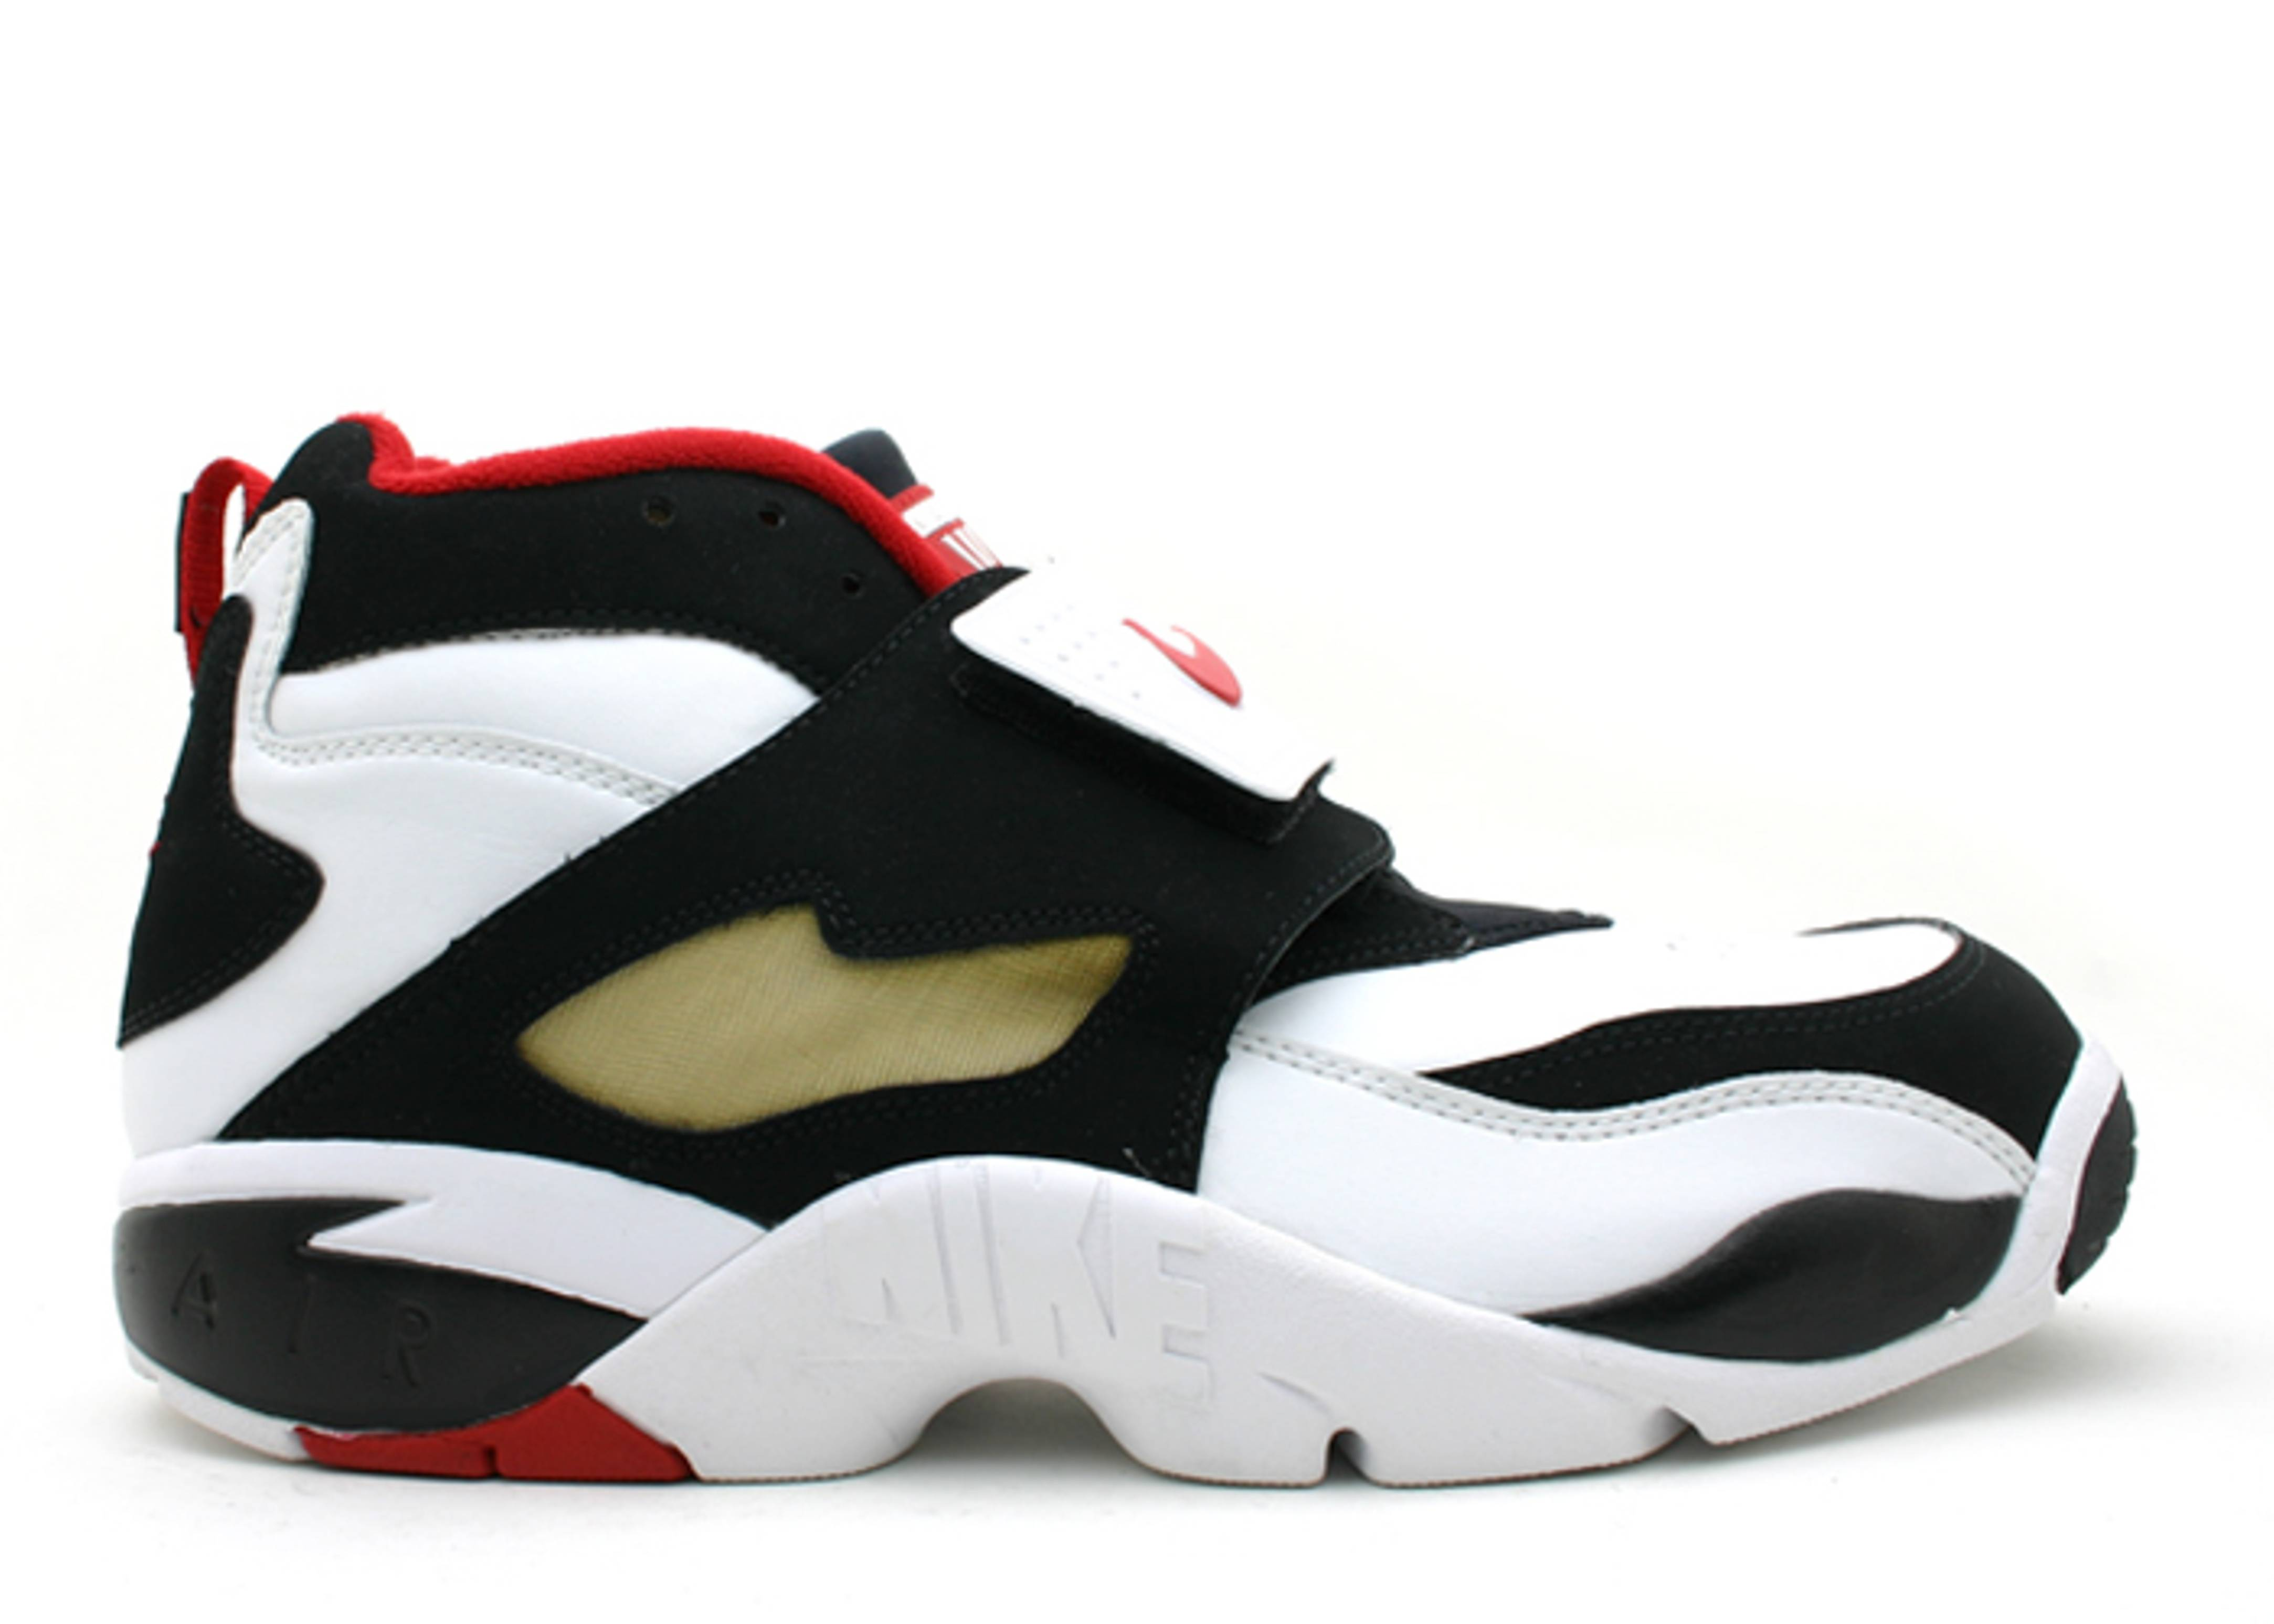 half off f8cd1 cd6a2 Air Diamond Turf - Nike - 309434 101 - white/black-varsity ...